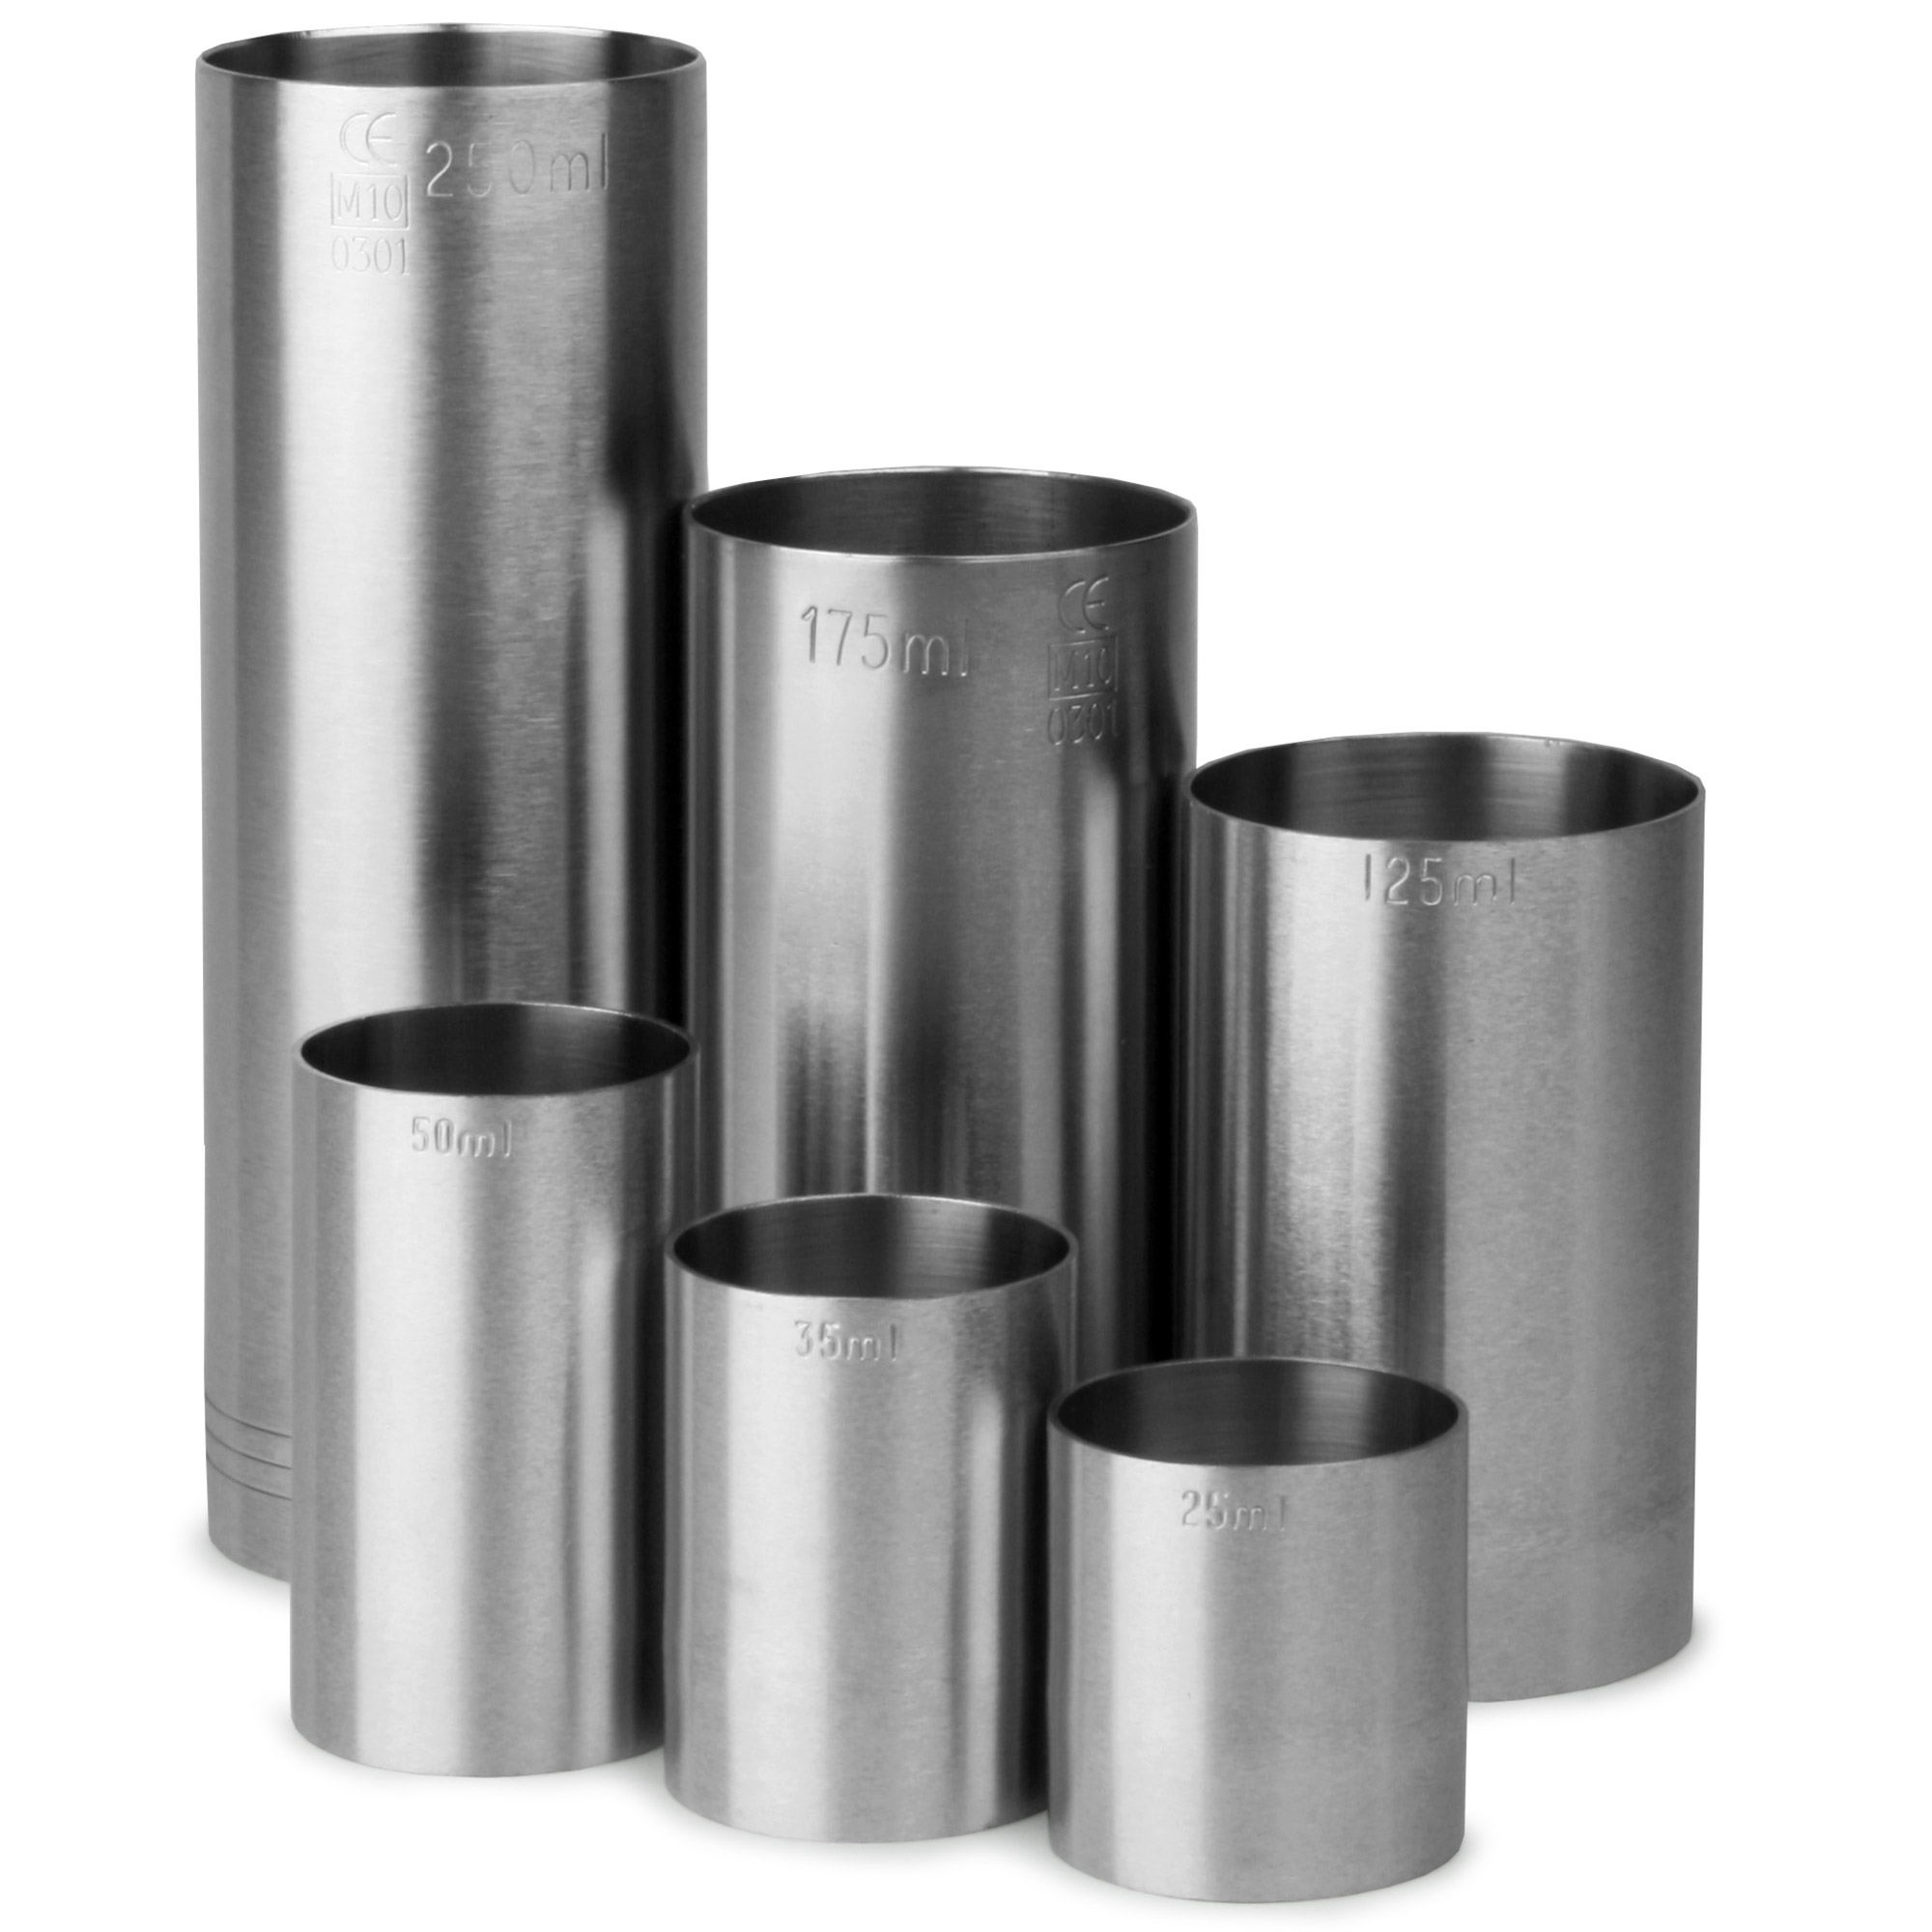 Stainless Steel Thimble Bar Measures 6 Piece Bundle Set